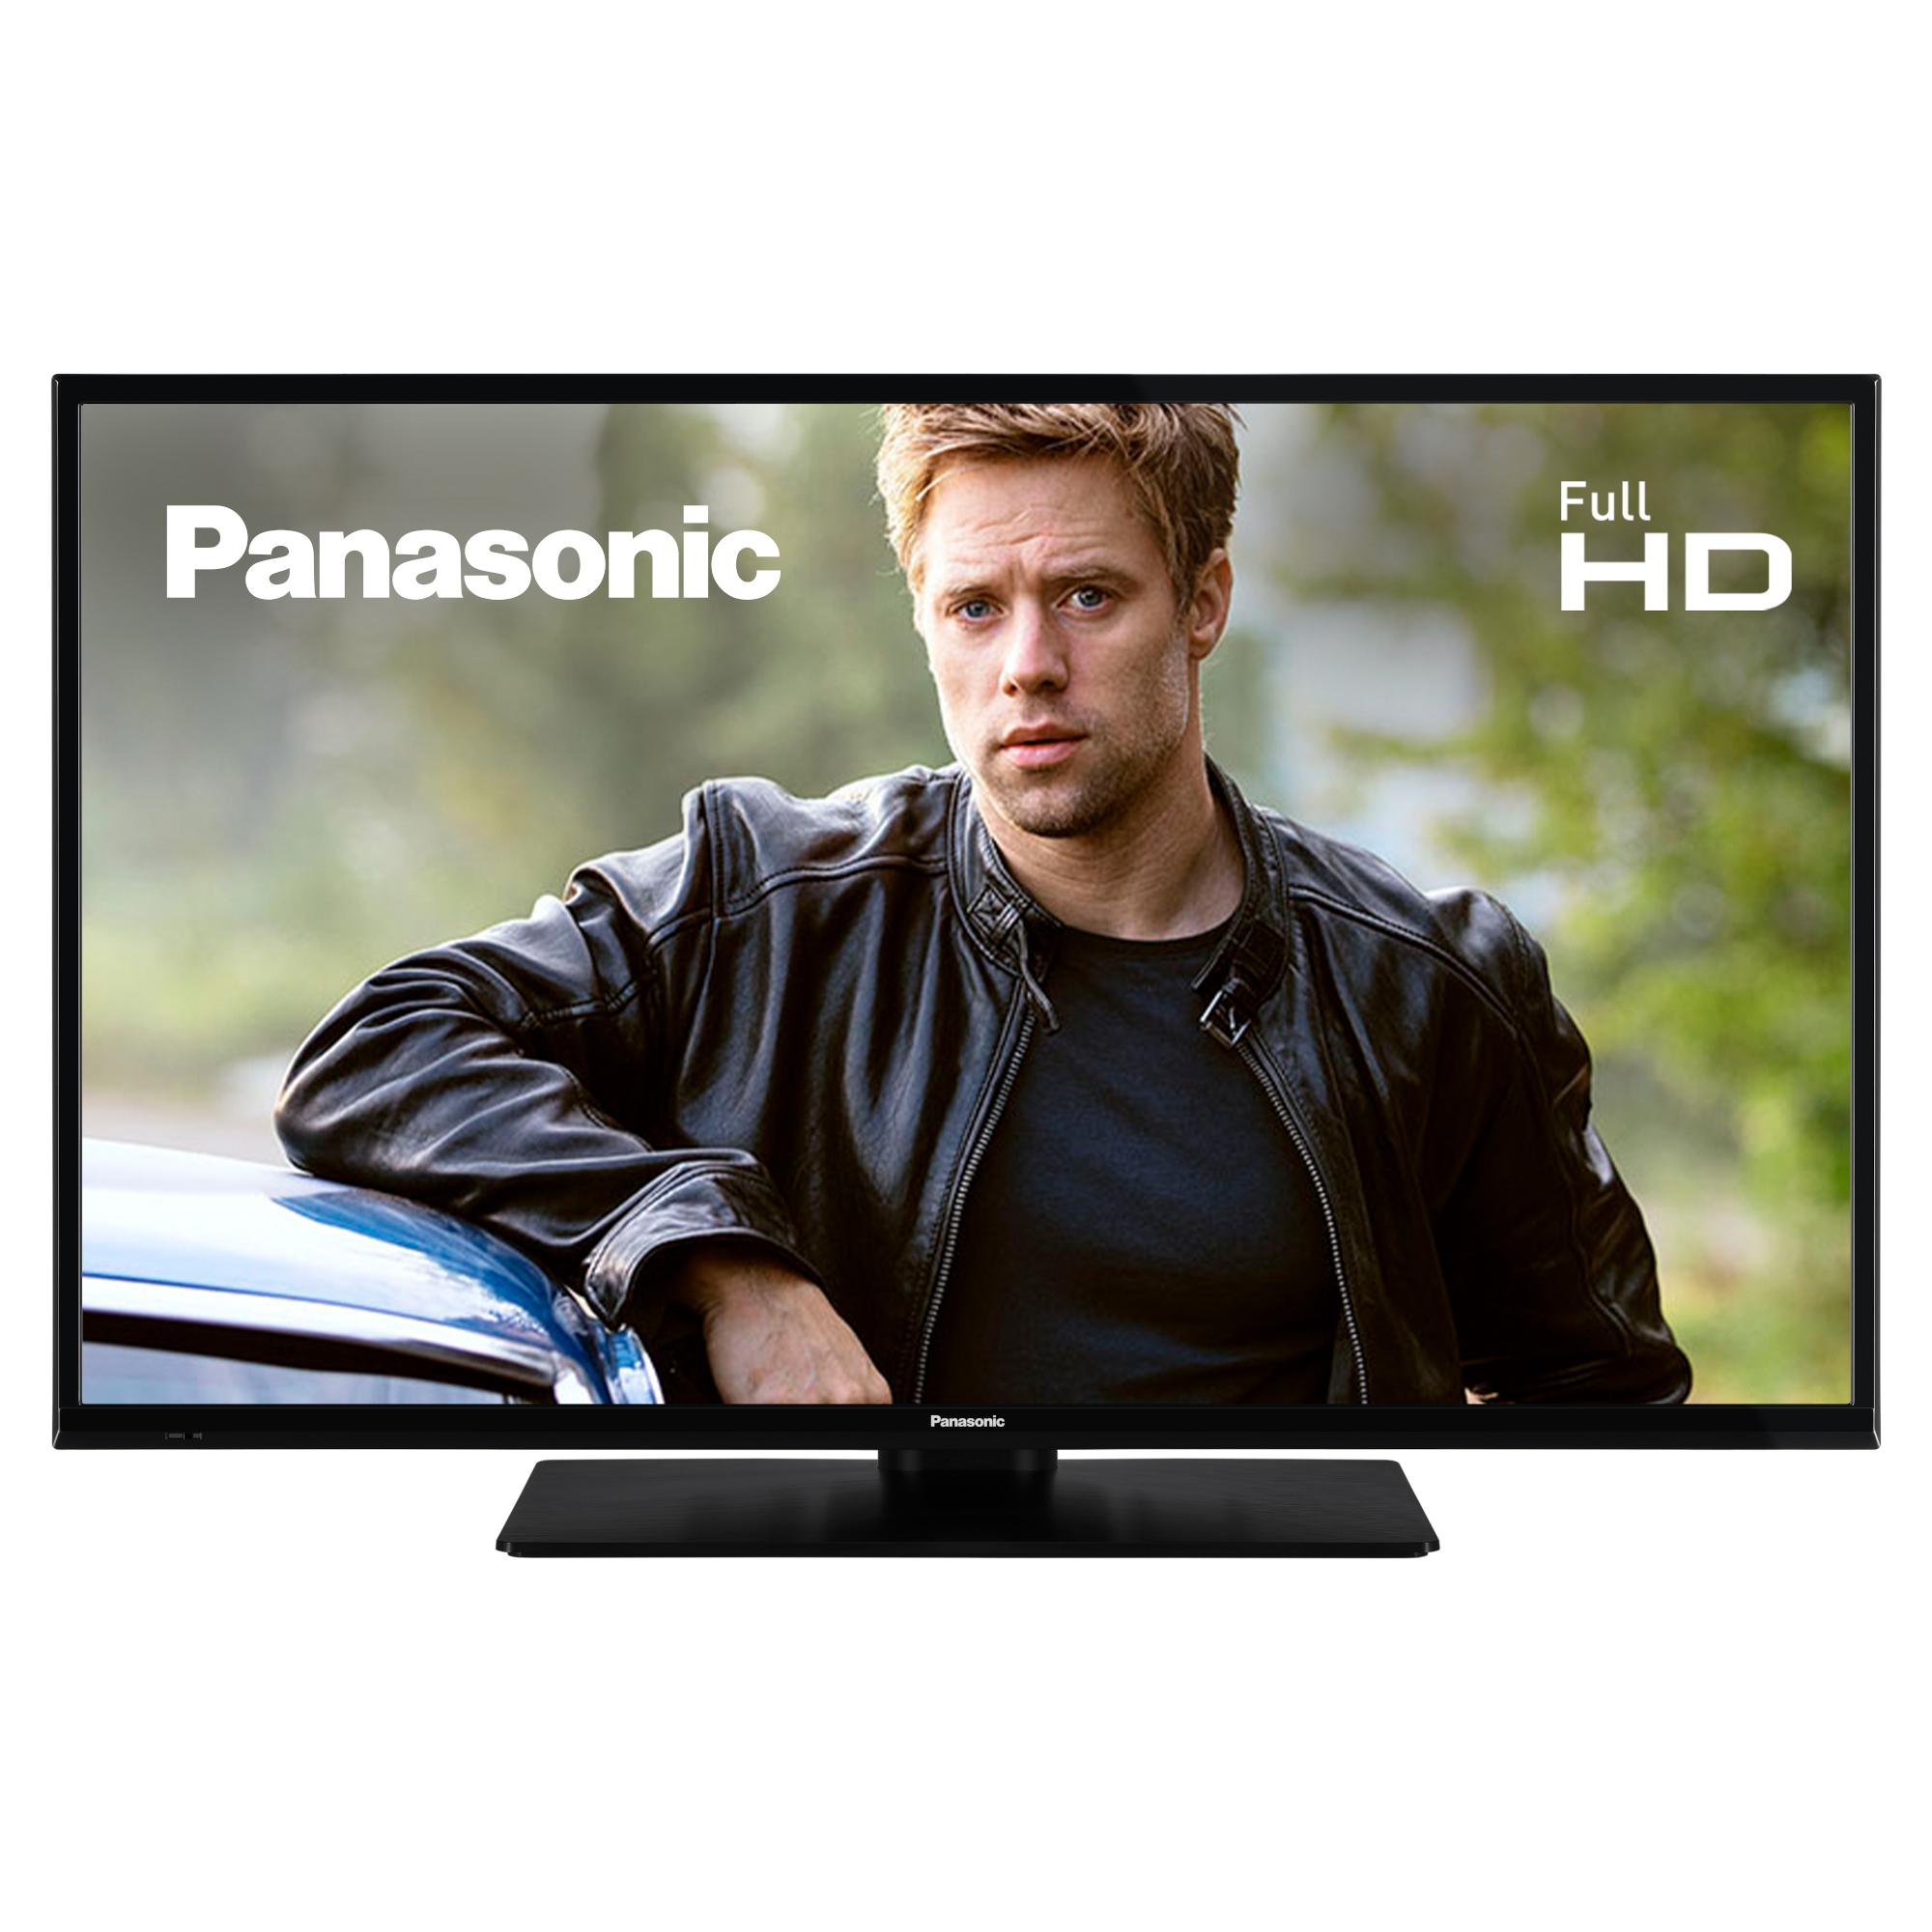 Panasonic TX24G302B 24 Full HD LED TV - £119.20 (With Code) @ Hughes / eBay